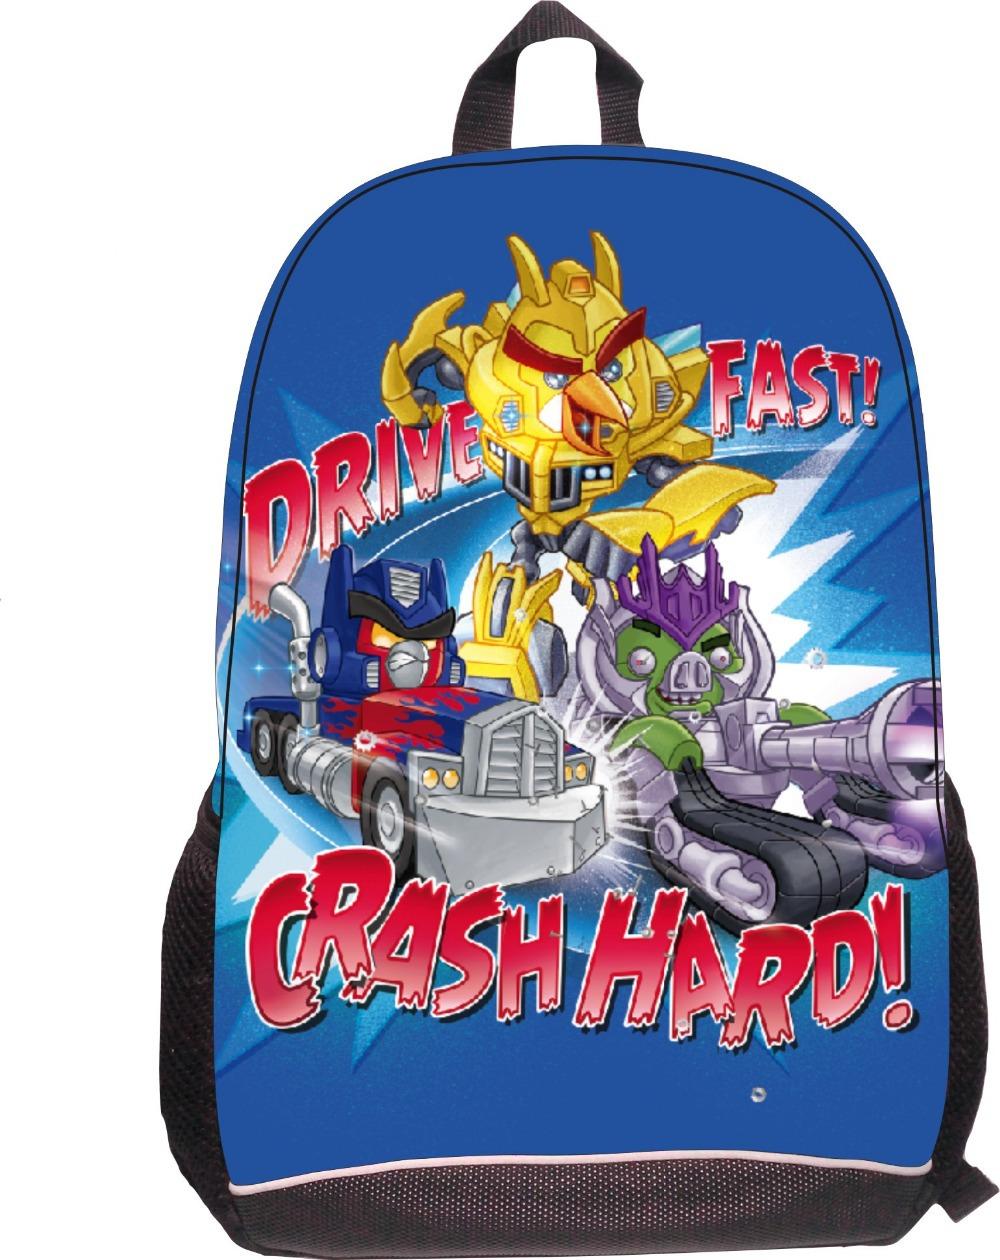 2014 hot sale new fashion backpack best selling lego batman school bags orthopedic cartoon lego avenger bag for kids(China (Mainland))